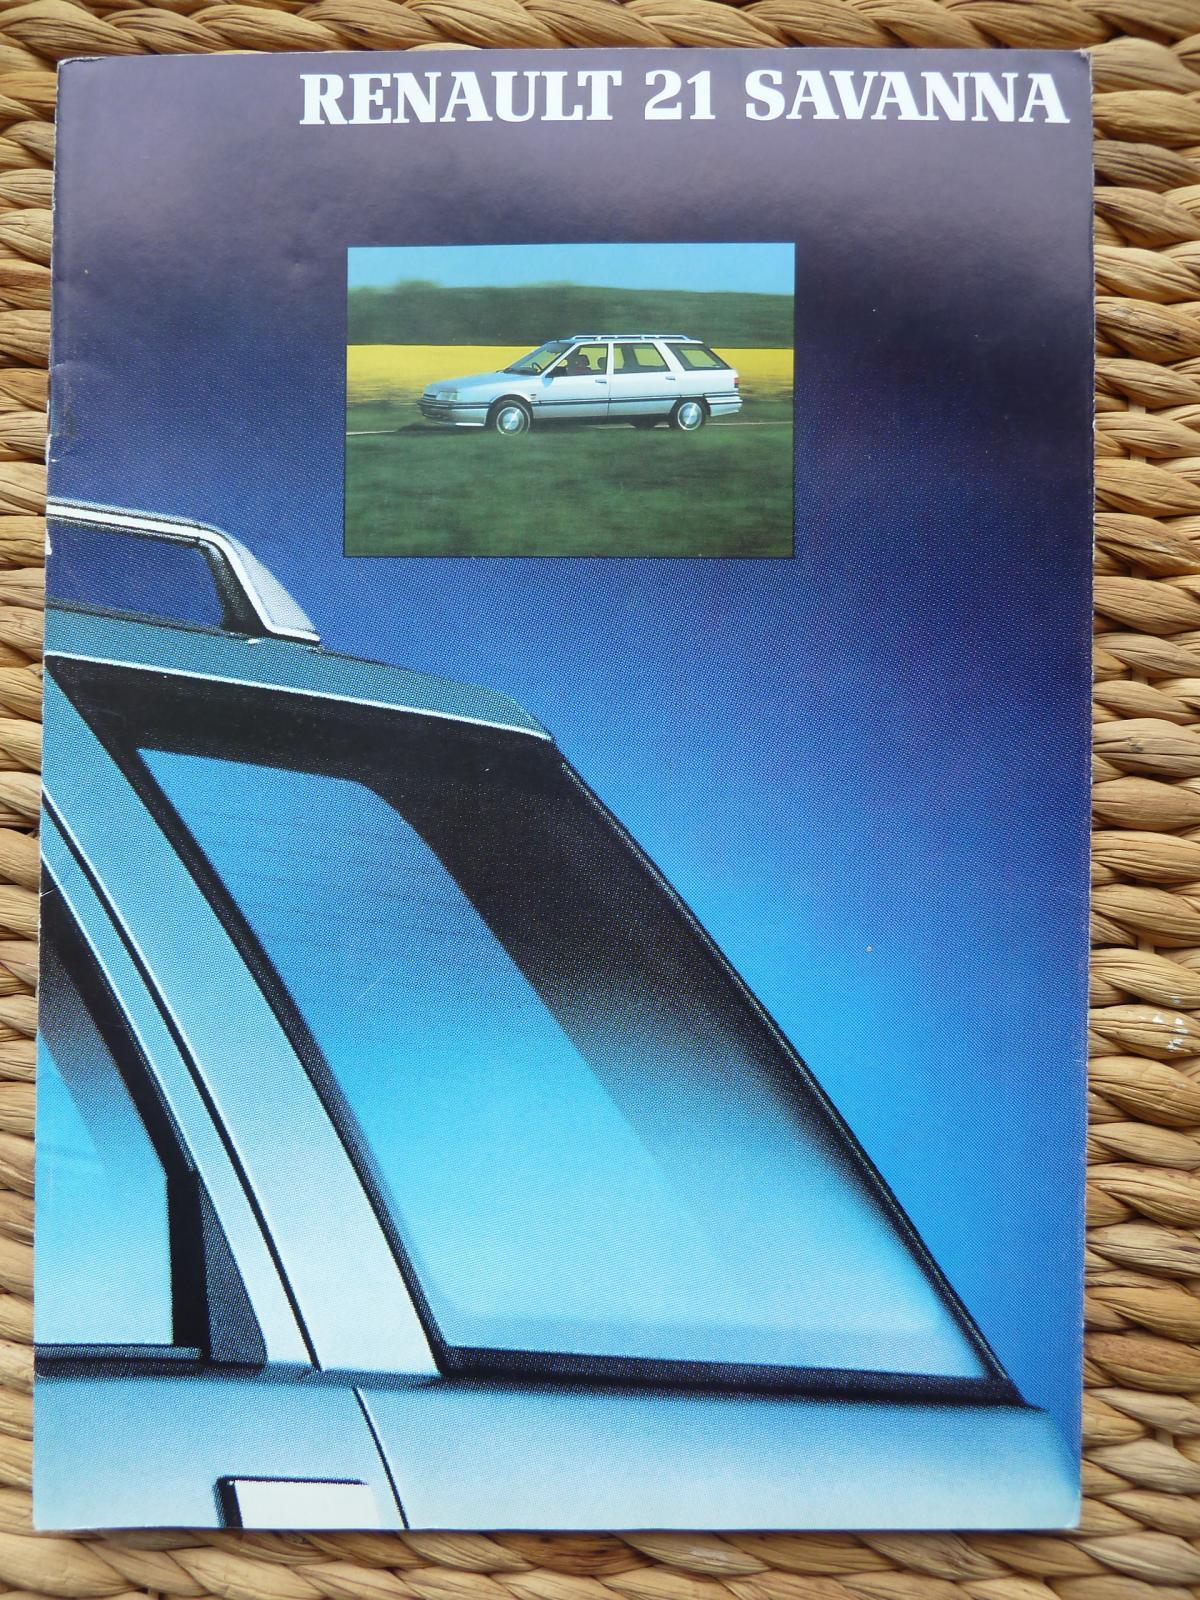 1990 Renault 21 Savanna.jpg